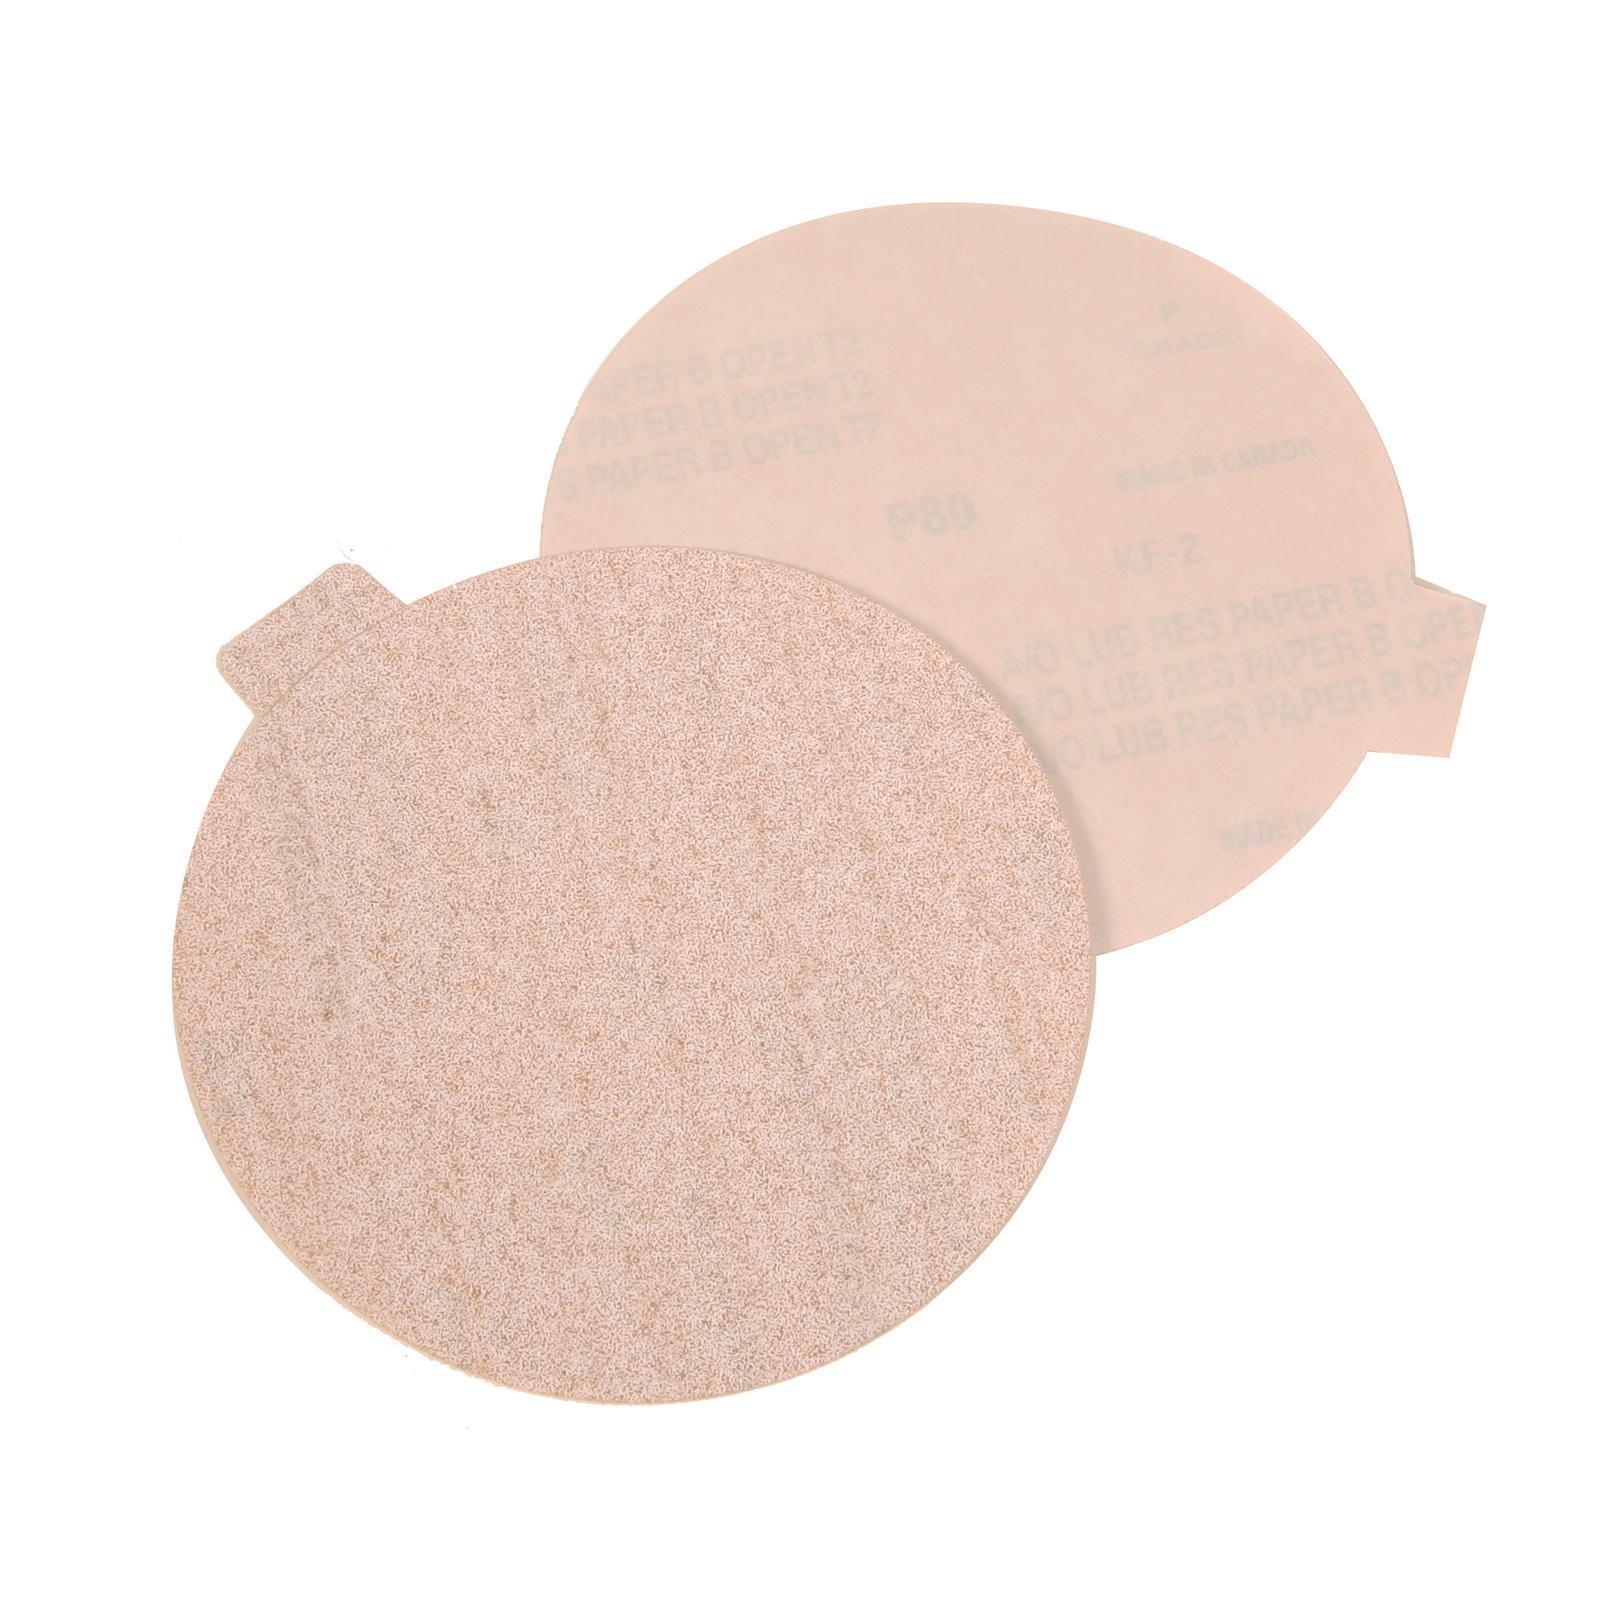 Carborundum Abrasives Sanding Discs